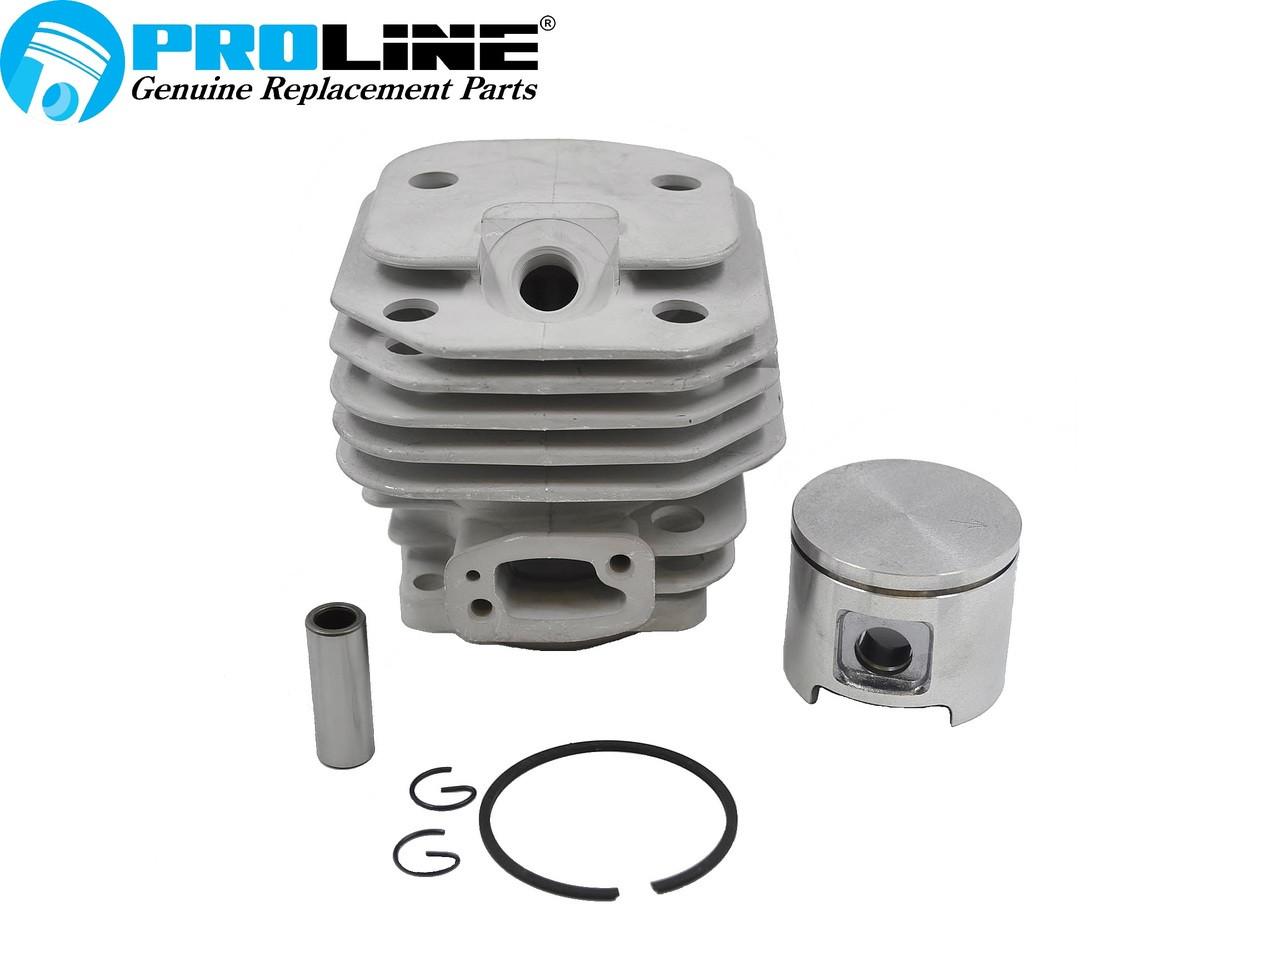 Proline® Cylinder Piston Kit For Husqvarna 61 Jonsered  630 48MM 503517502